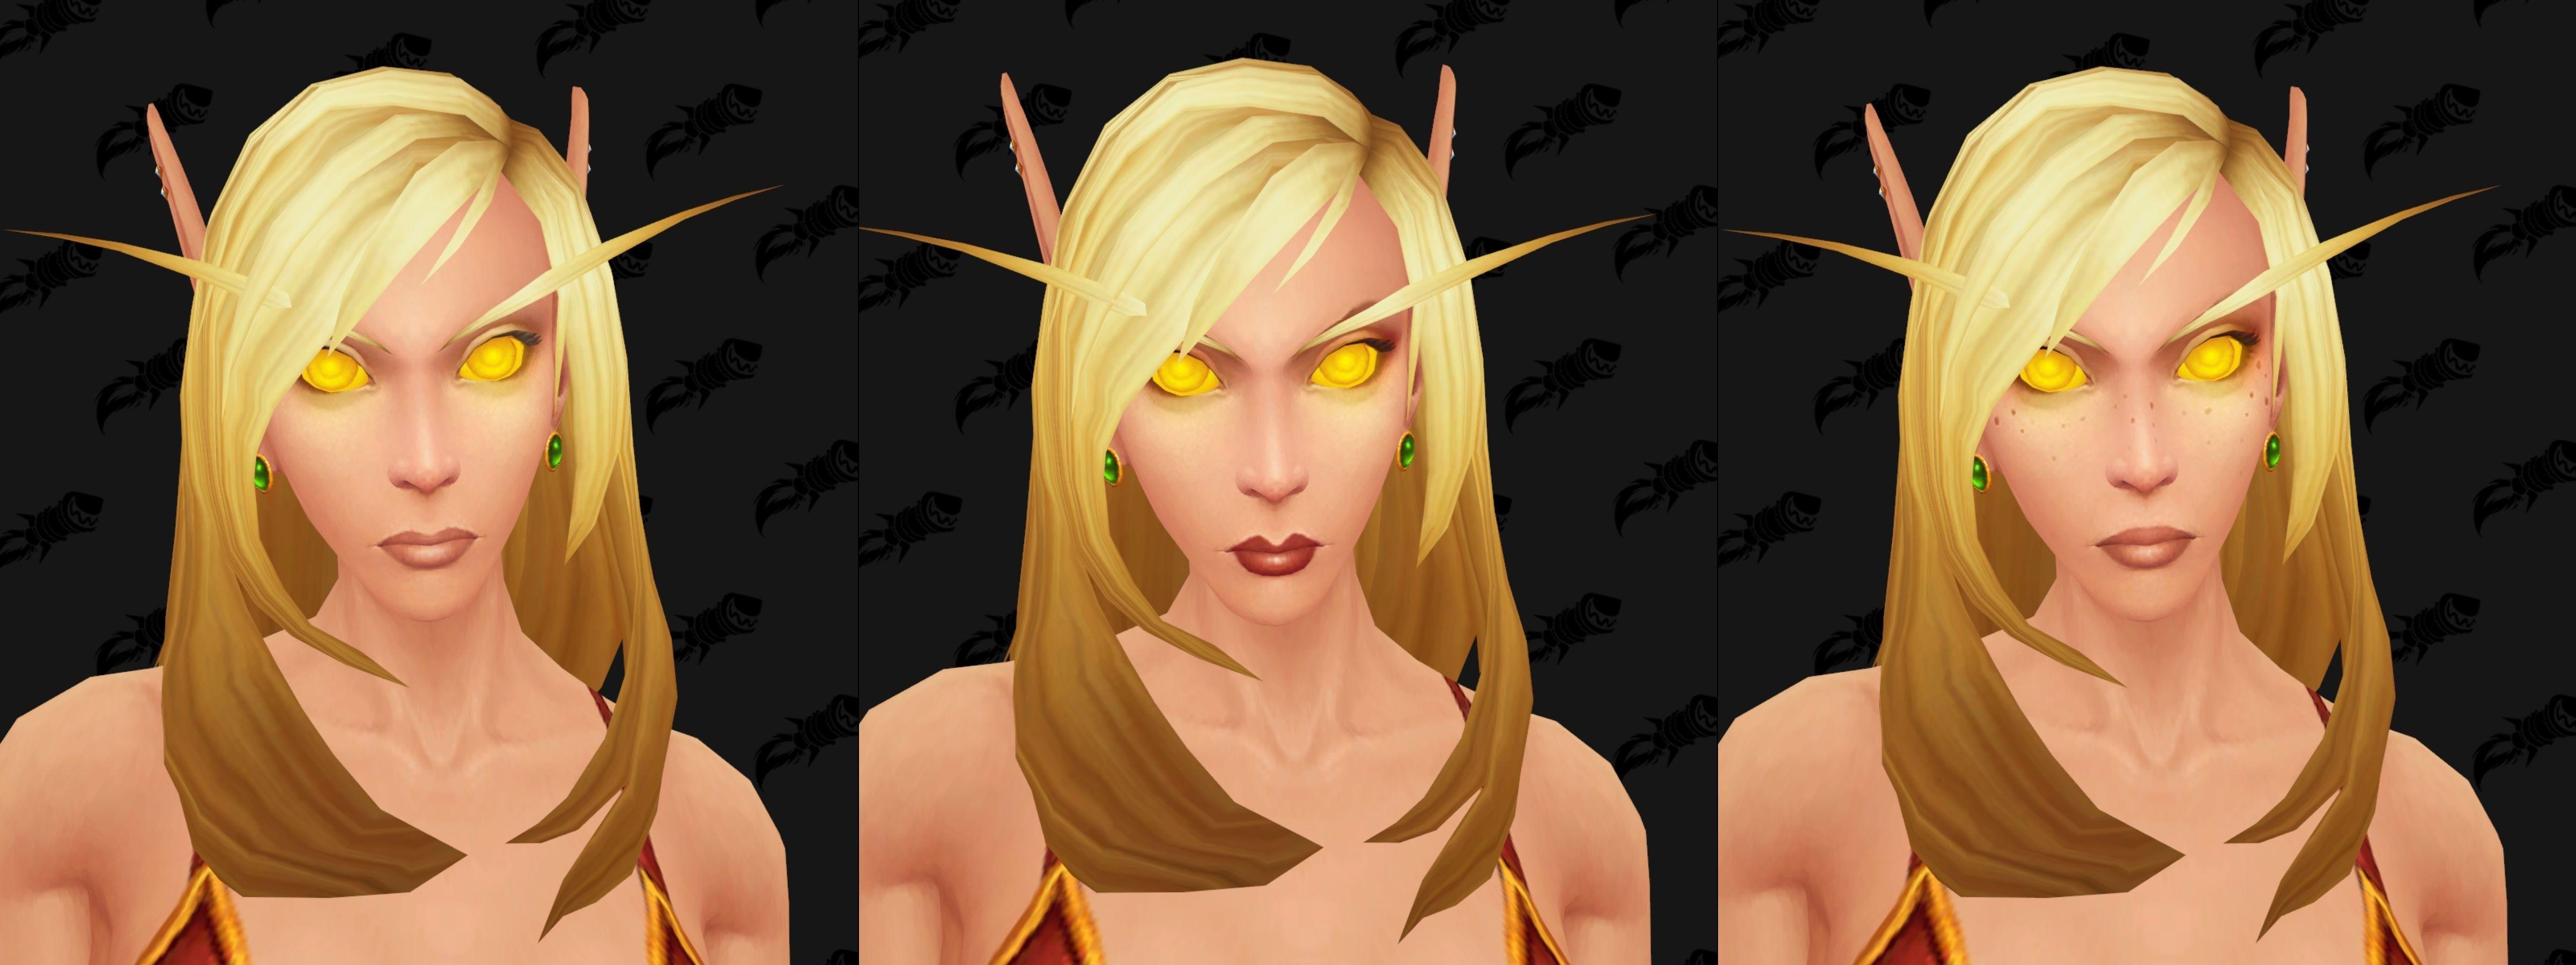 WoW Blood Elf Golden Eyes Female